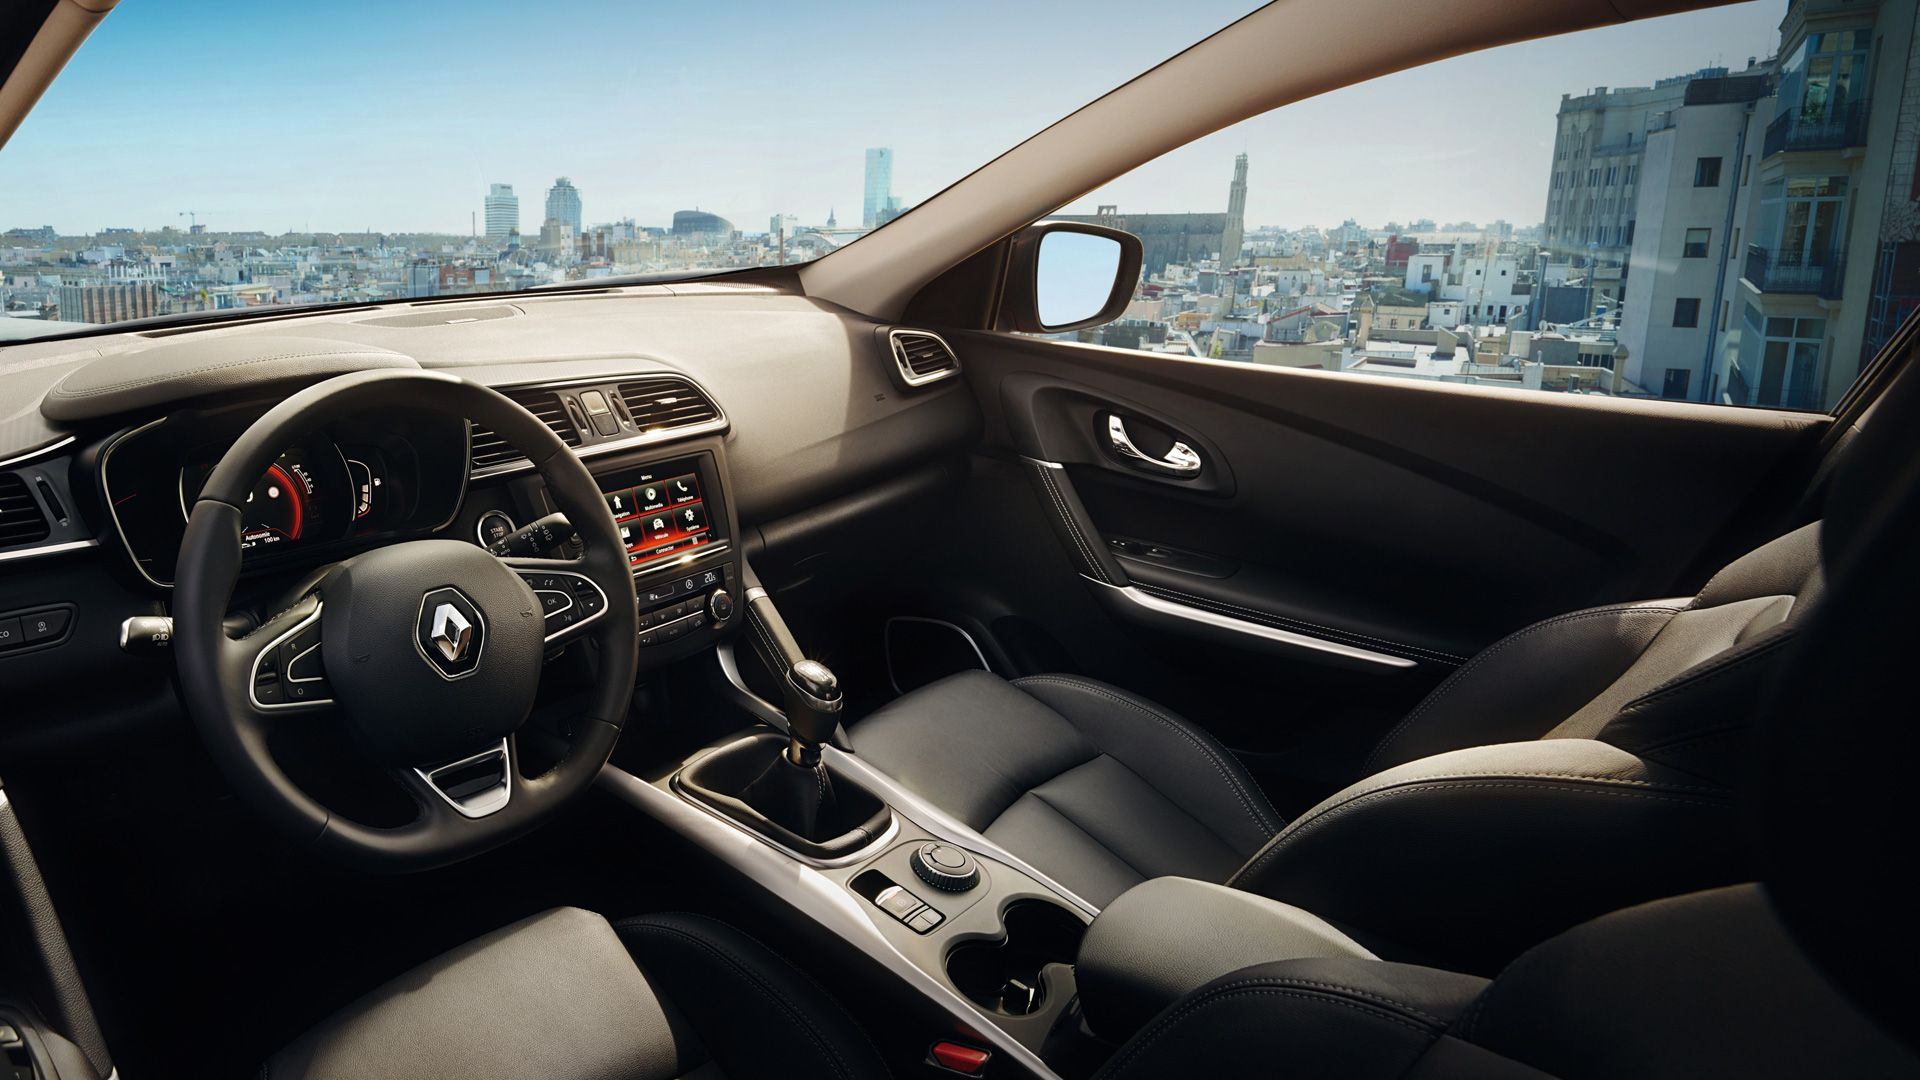 Renault Kadjar Neuer Suv Suv Reviews Renault Suv